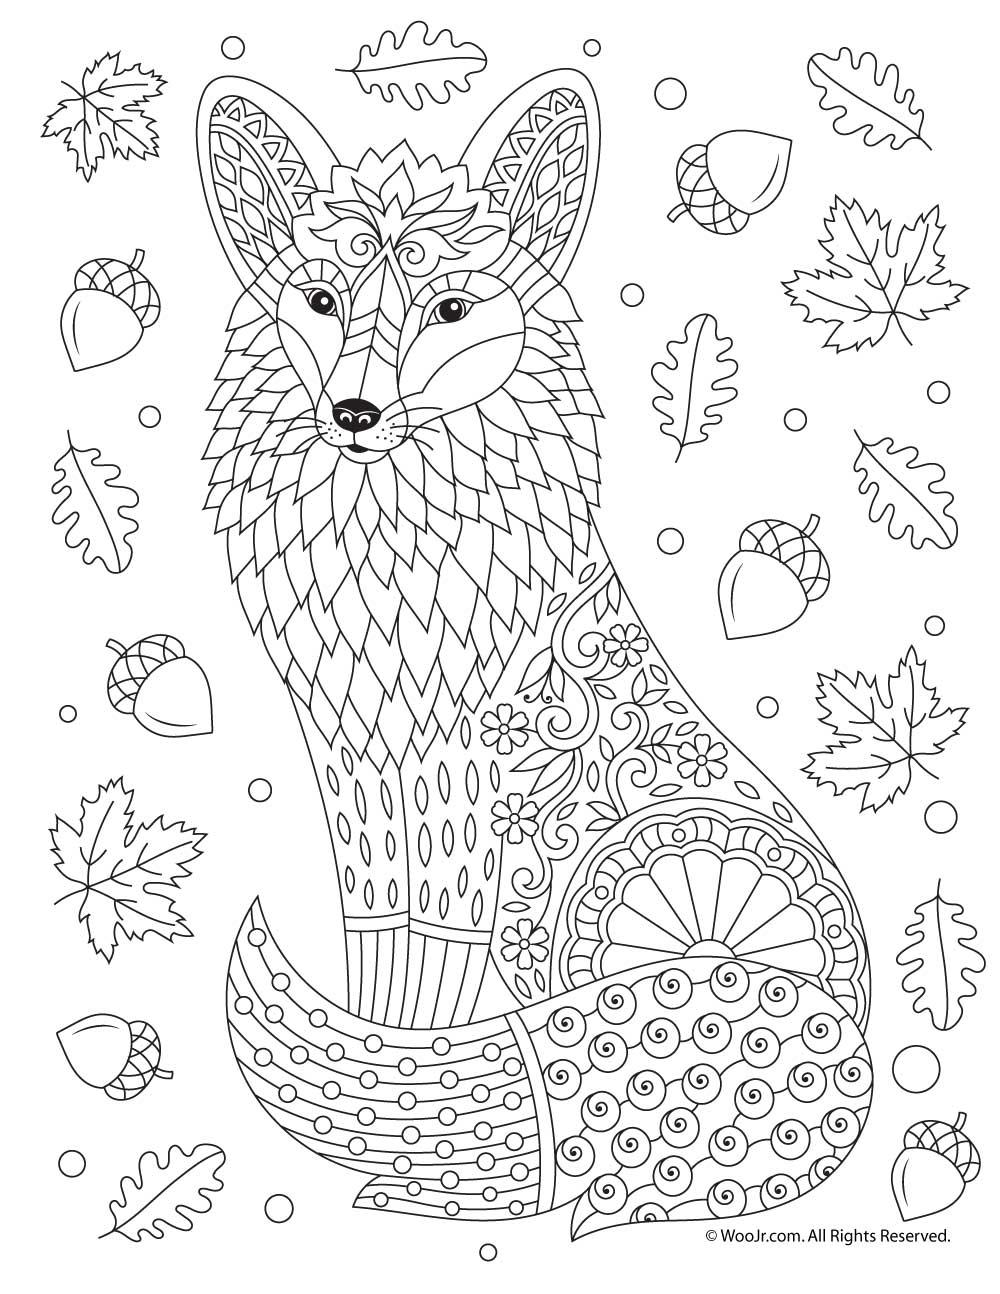 Fox Adult Coloring Page | Woo! Jr. Kids Activities